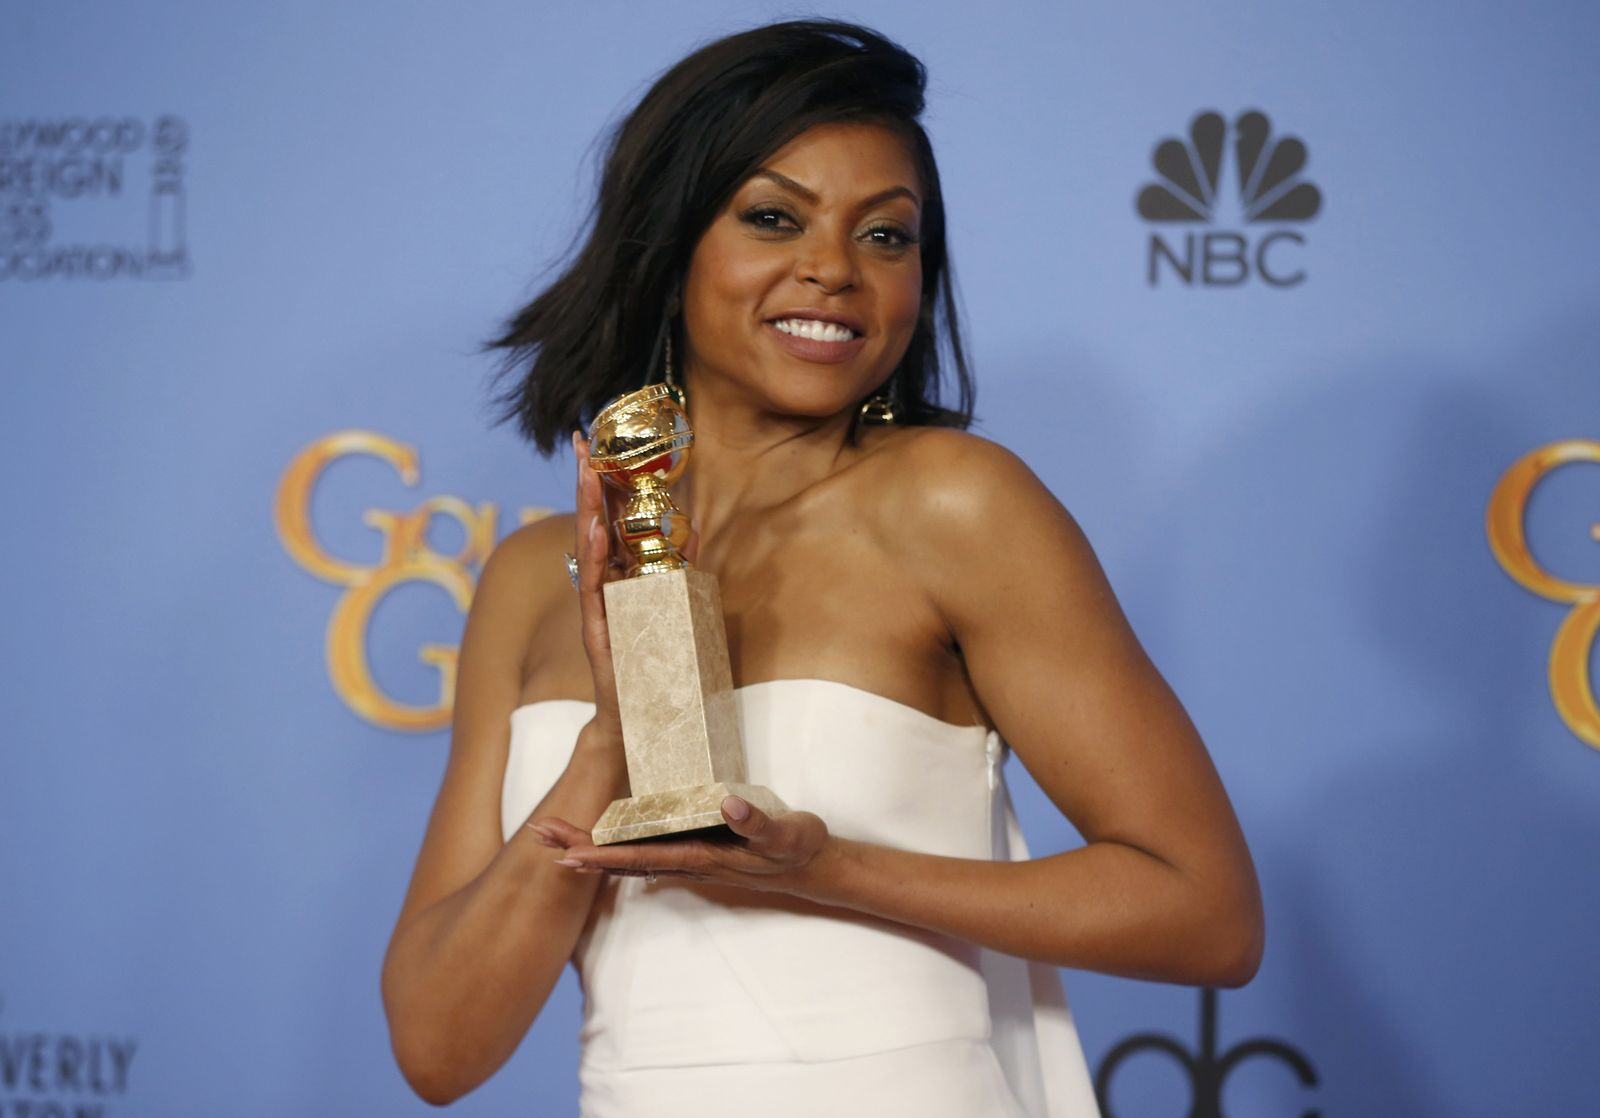 Golden Globe Awards Taraji P. Henson